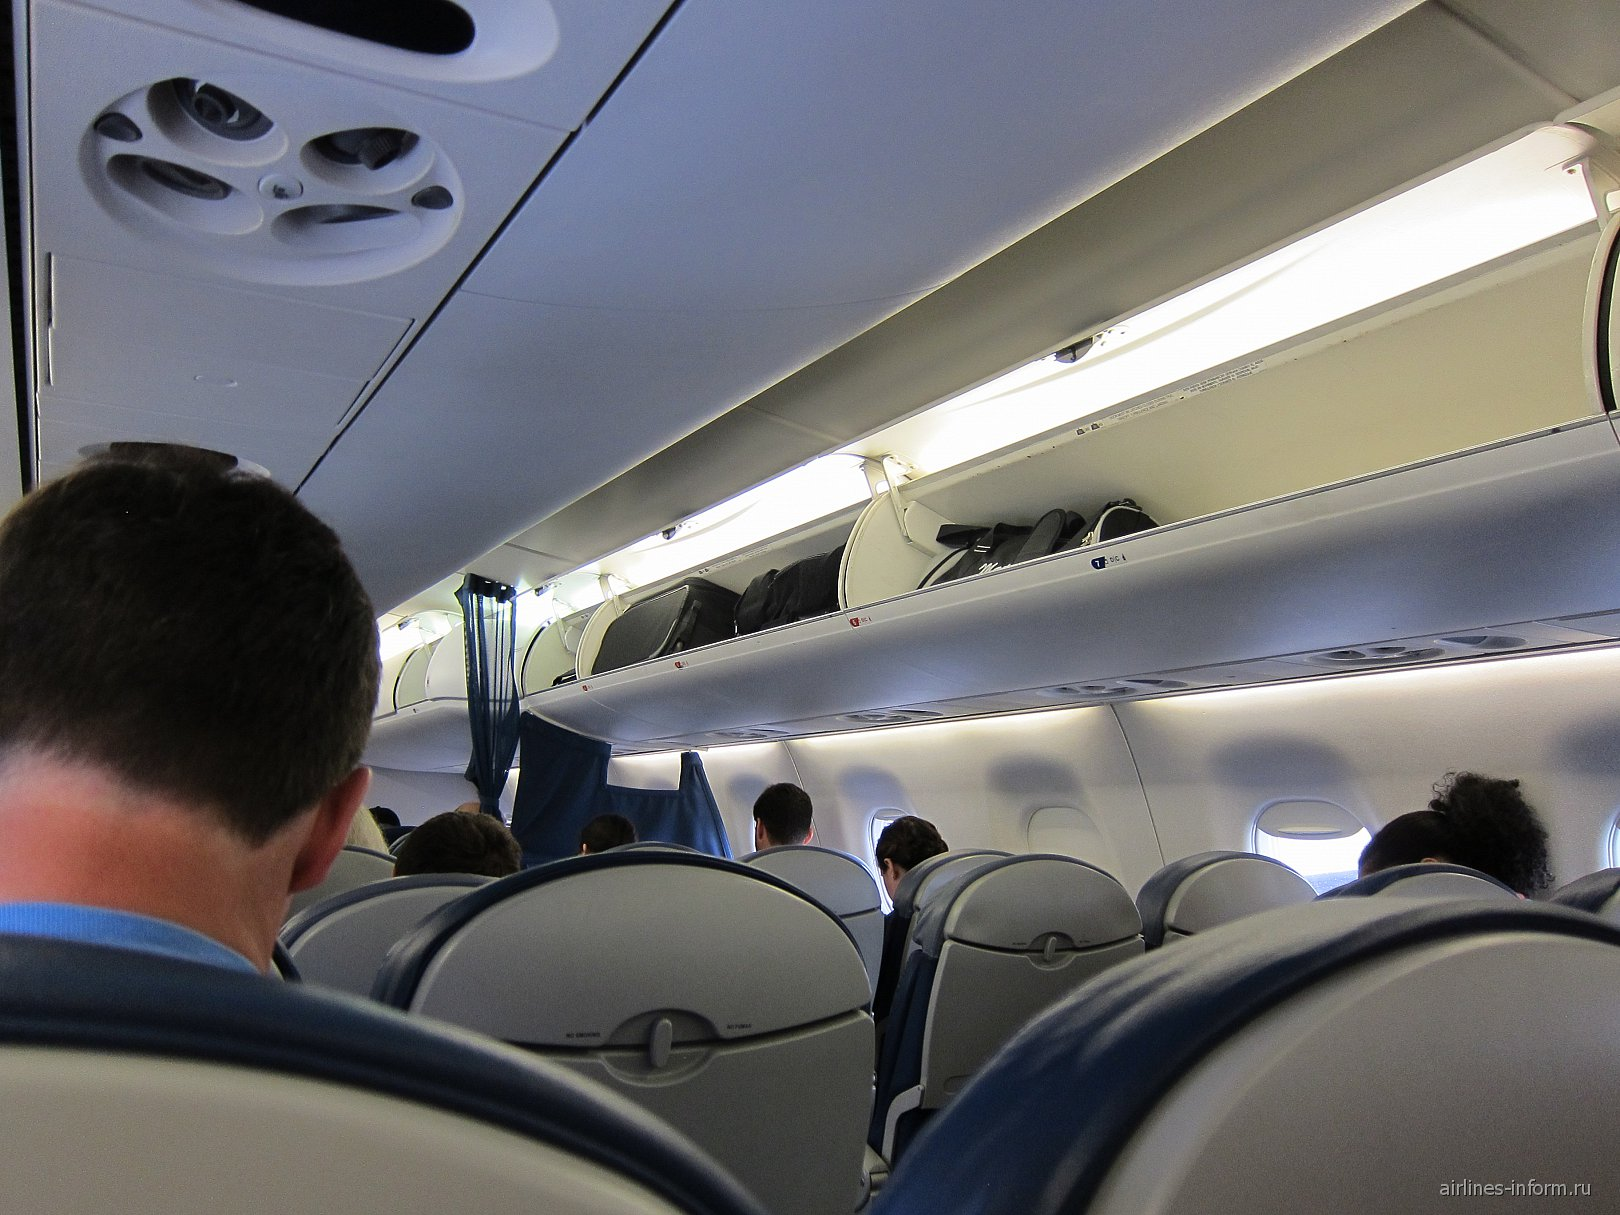 Салон самолета Embraer 175 авиакомпании Delta Air Lines